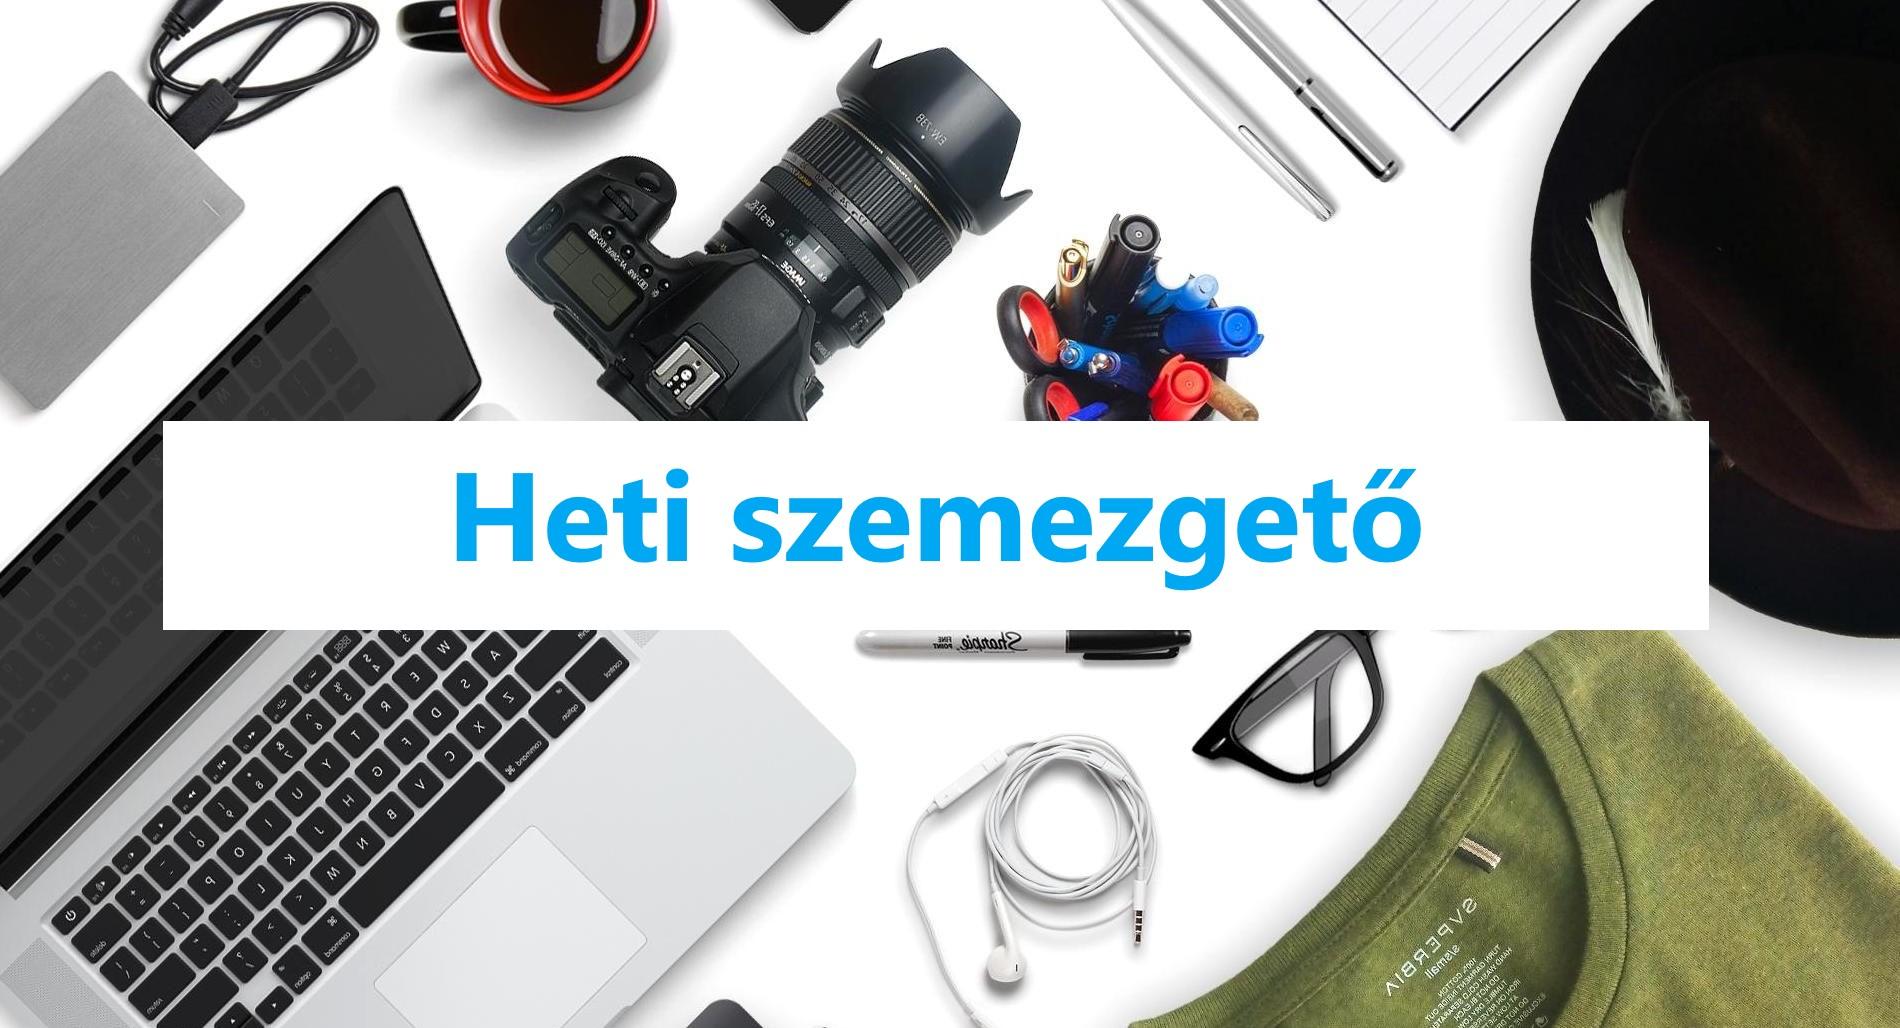 heti_szemezgeto_uj_54.jpg